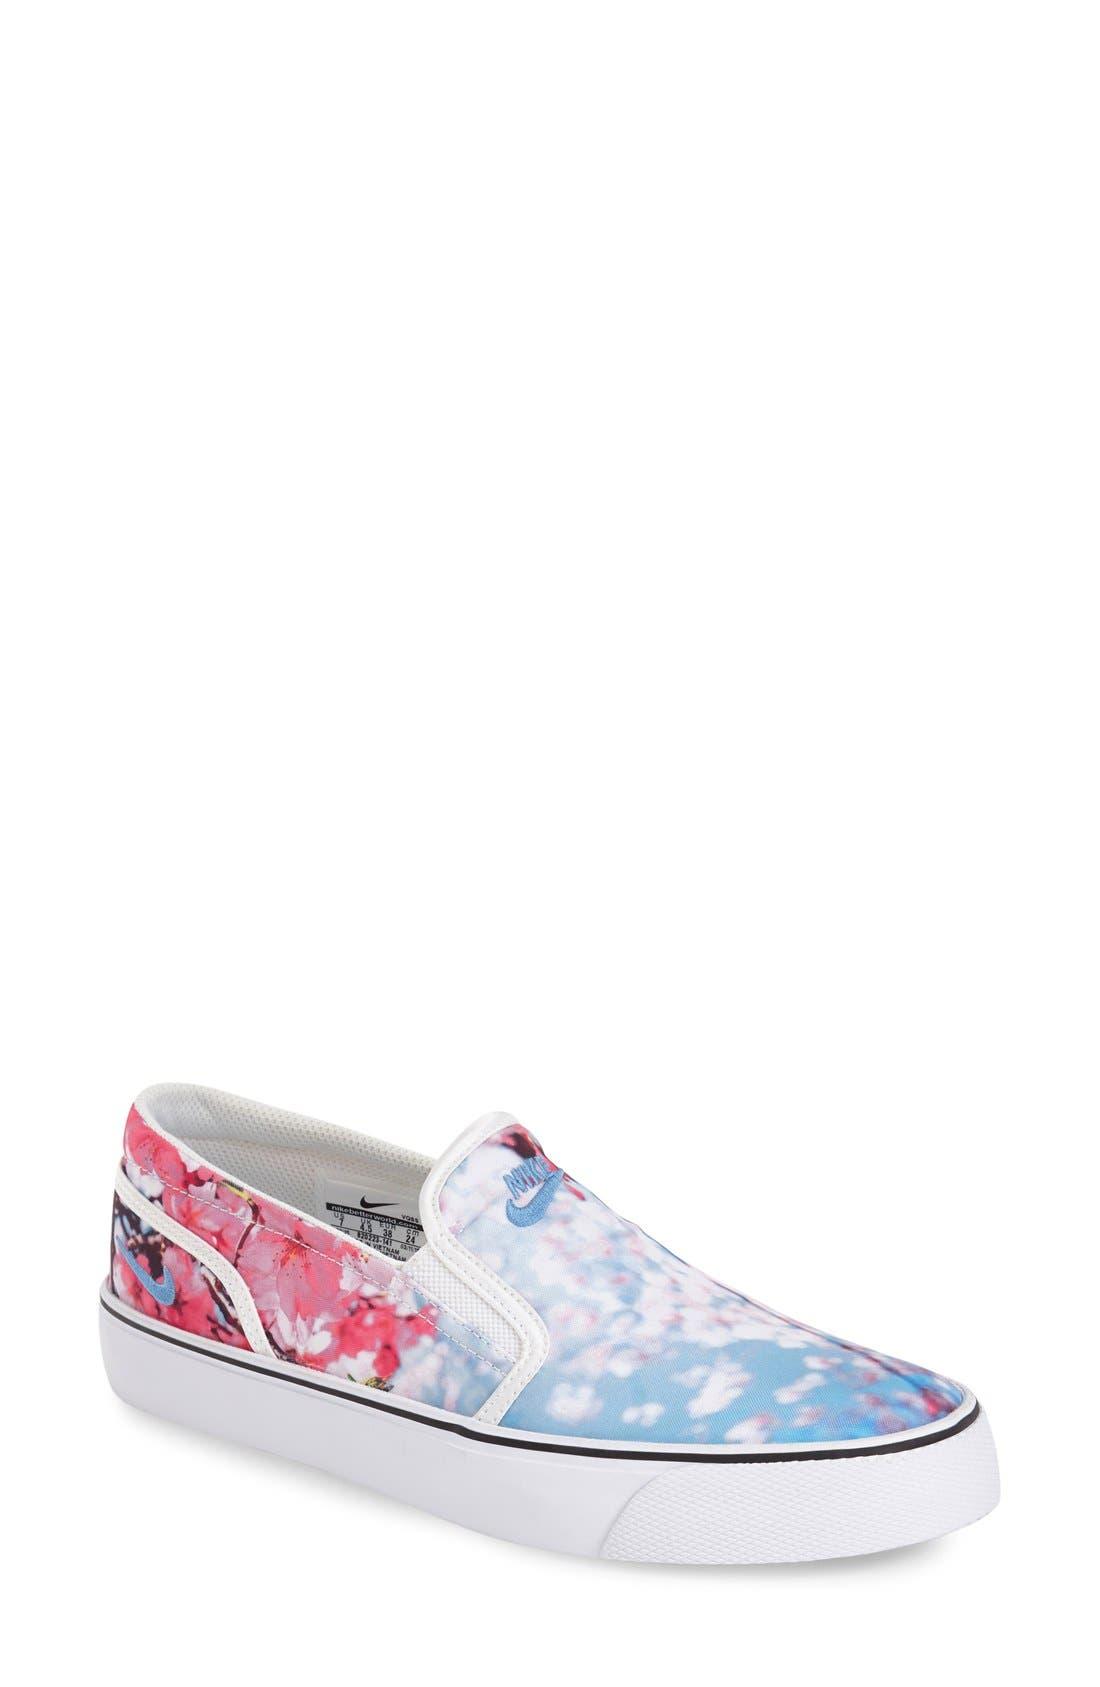 Alternate Image 1 Selected - Nike 'Toki' Print Slip-On Sneaker (Women)